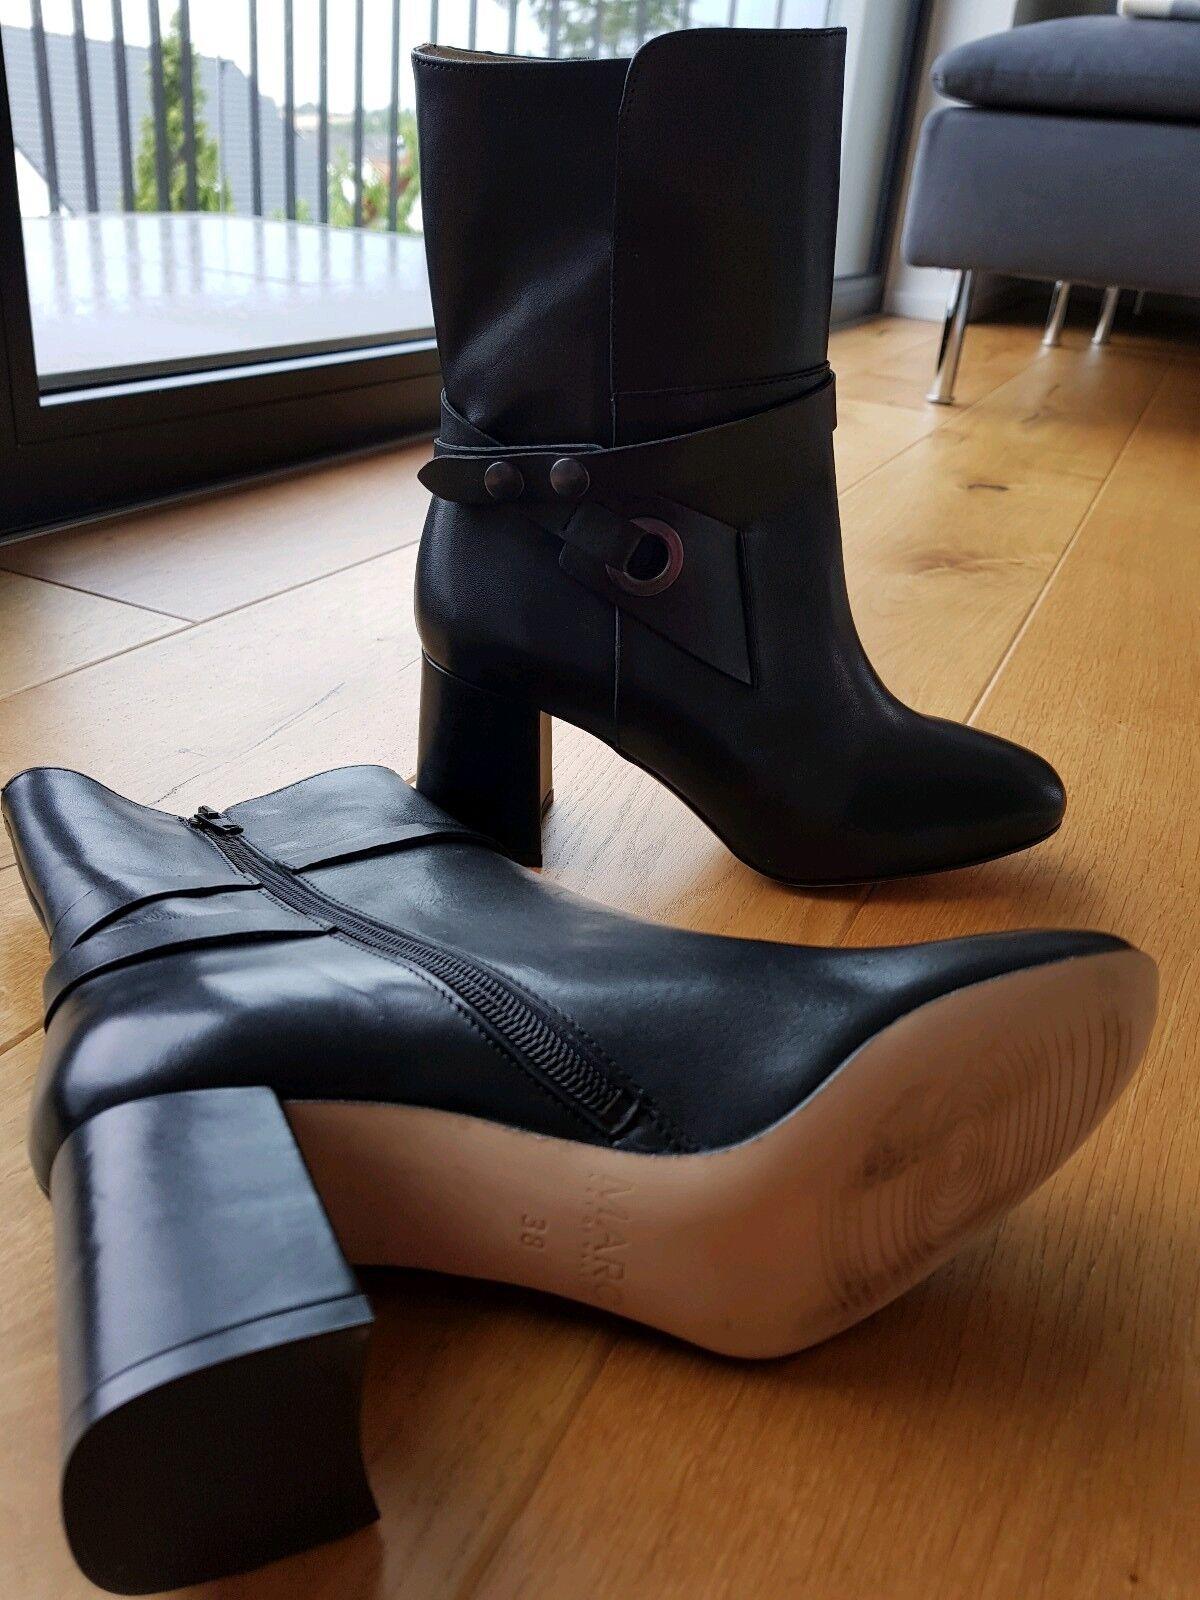 Schuhe 38 damen Marc Echtleder    Schwarz Neu  | Verschiedene aktuelle Designs  7f3ea8